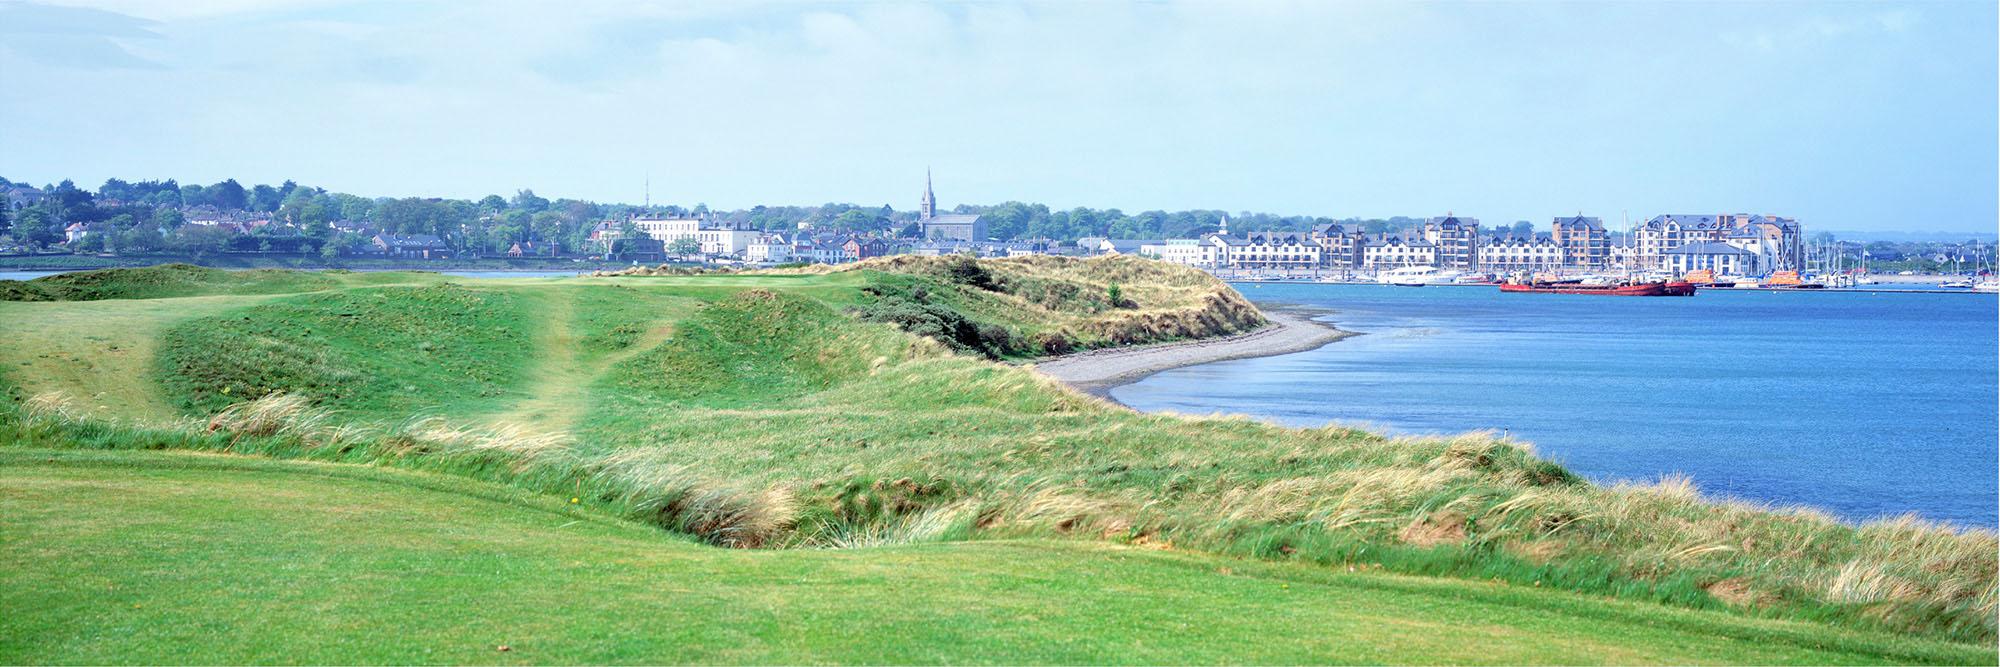 Golf Course Image - The Island Golf Club No. 13